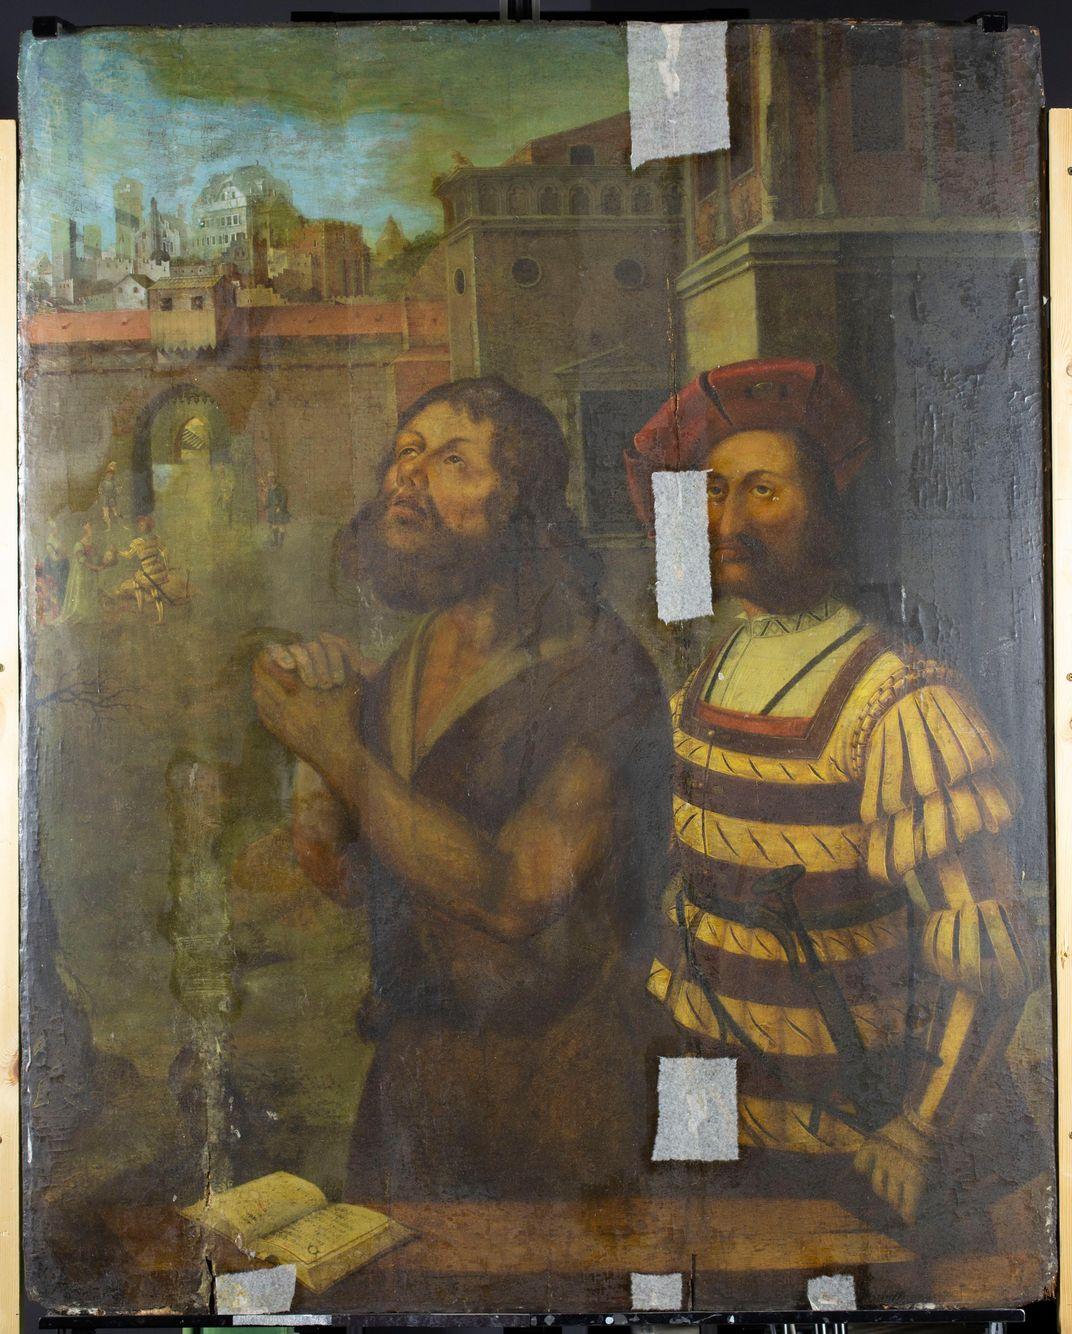 Nativity Scene Discovered Beneath 16th-Century Painting of John the Baptist's Beheading